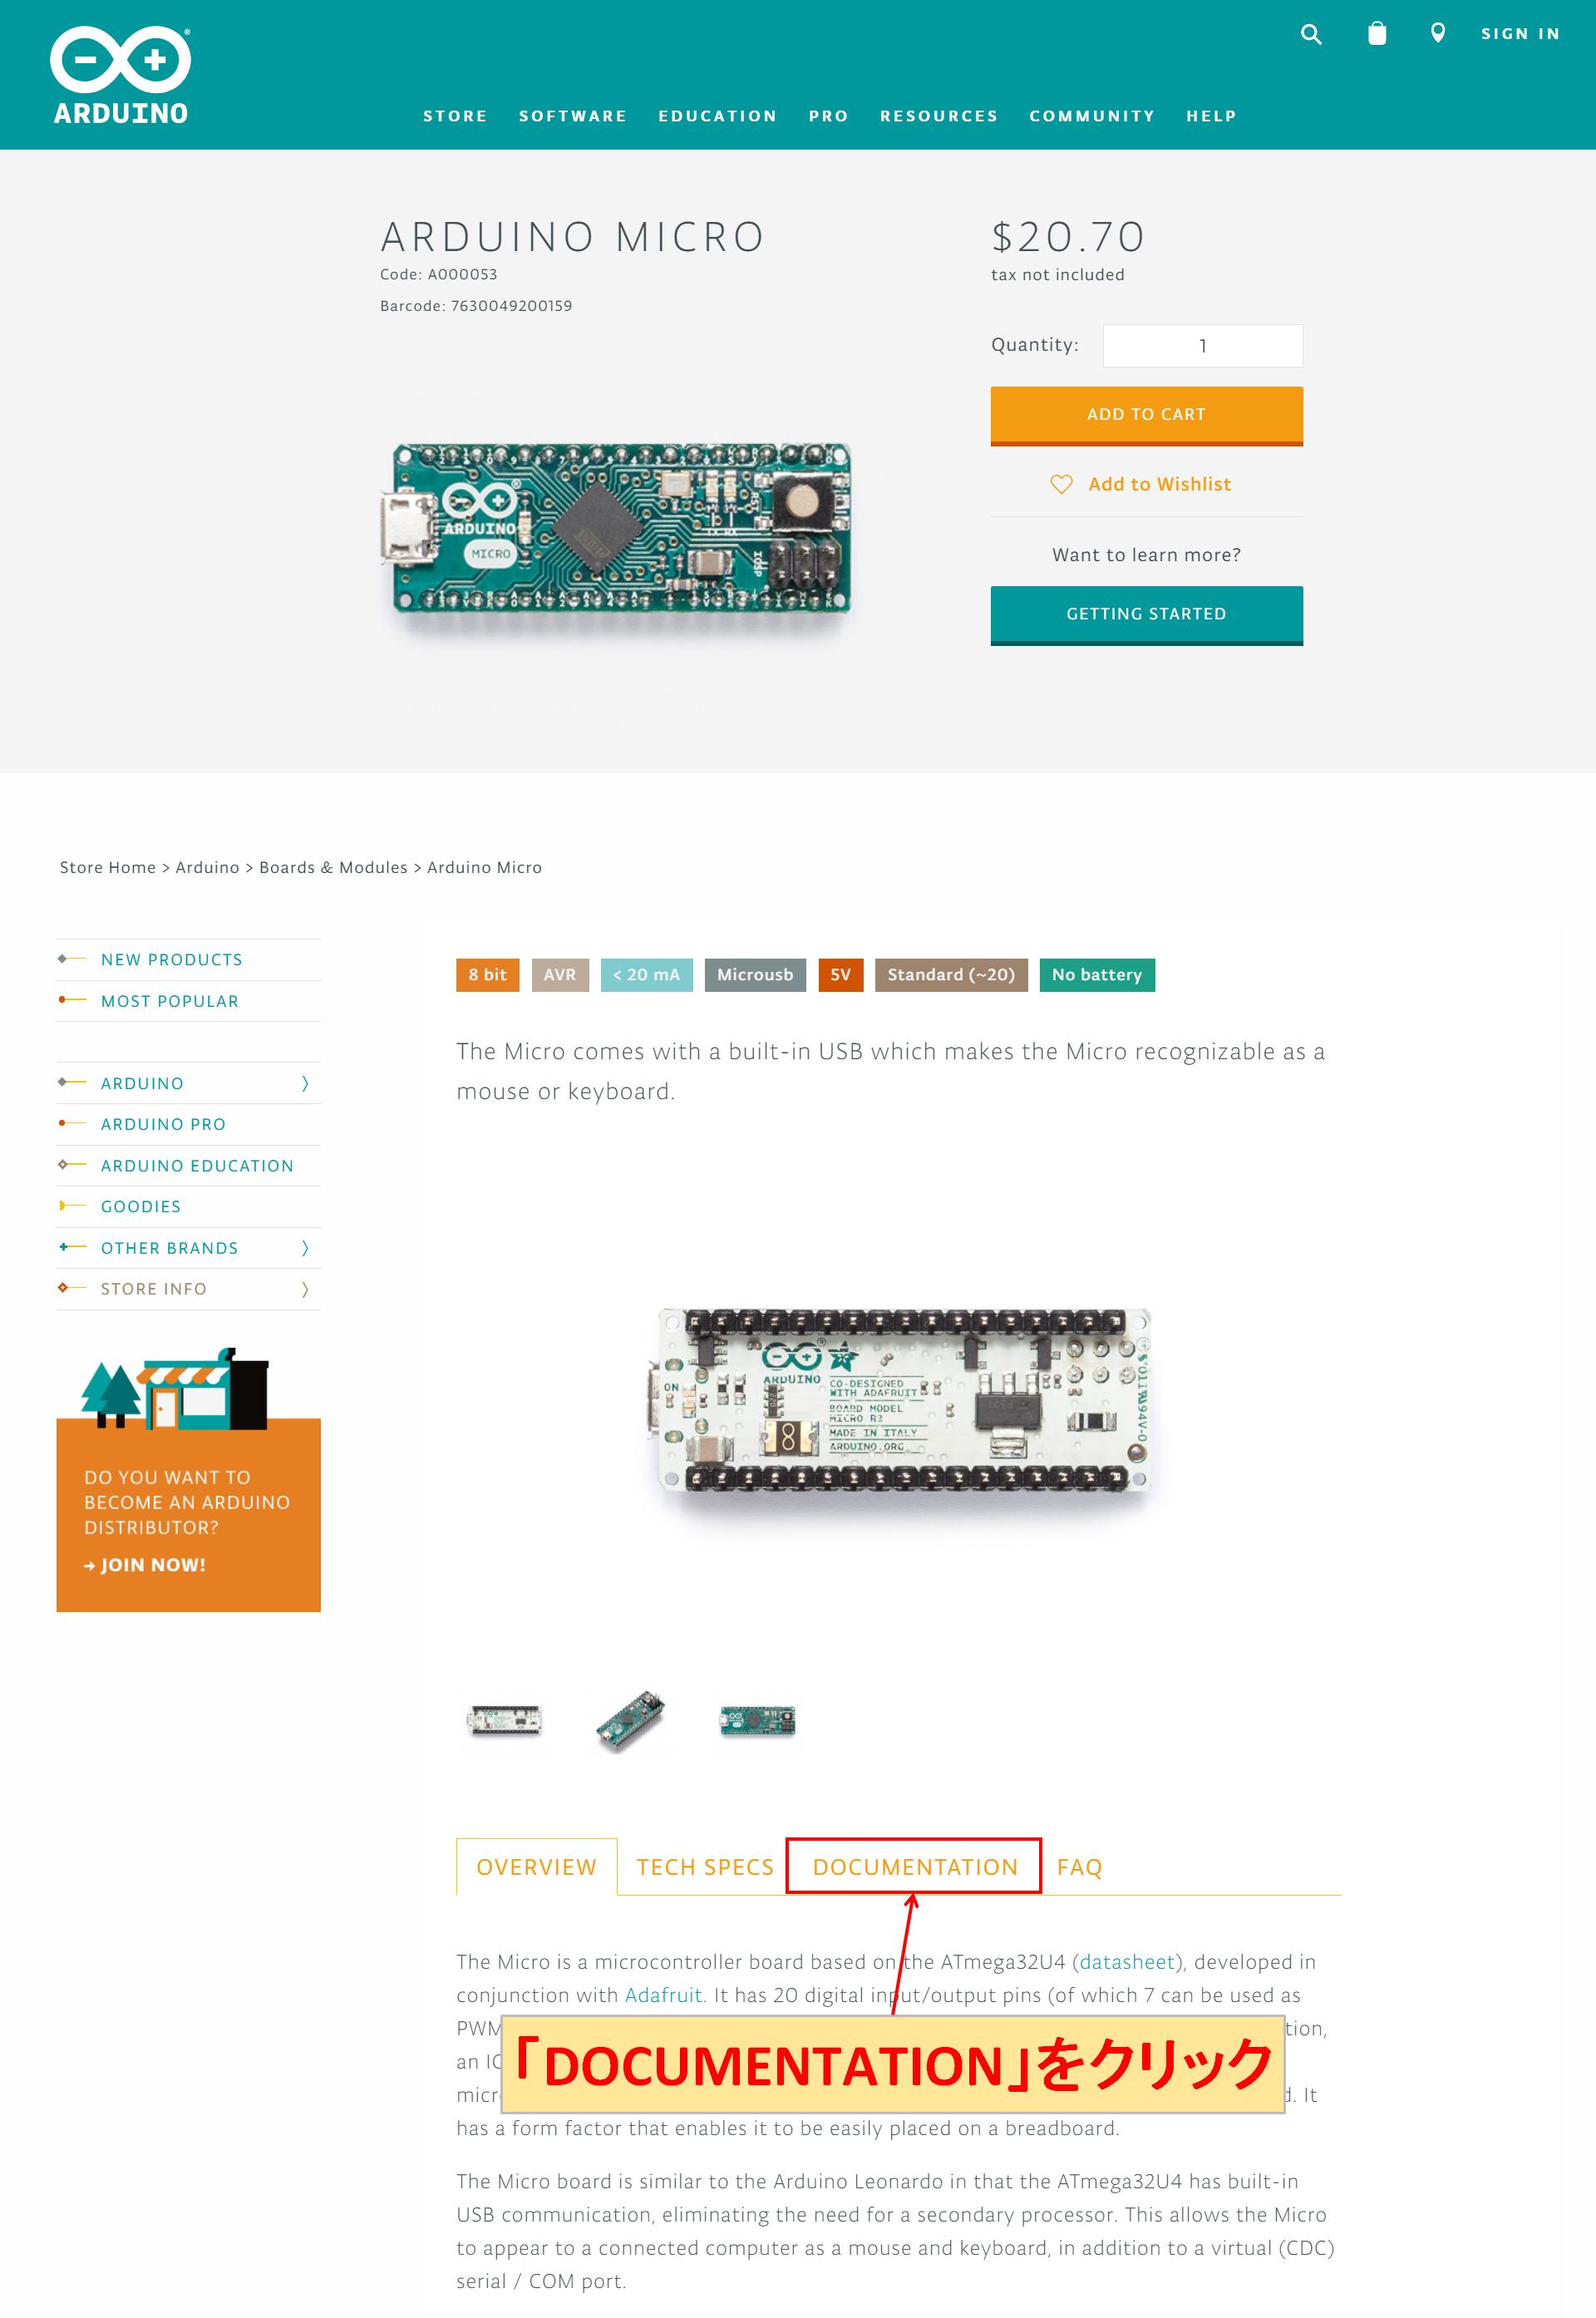 Arduino Micro DOCUMENTATION